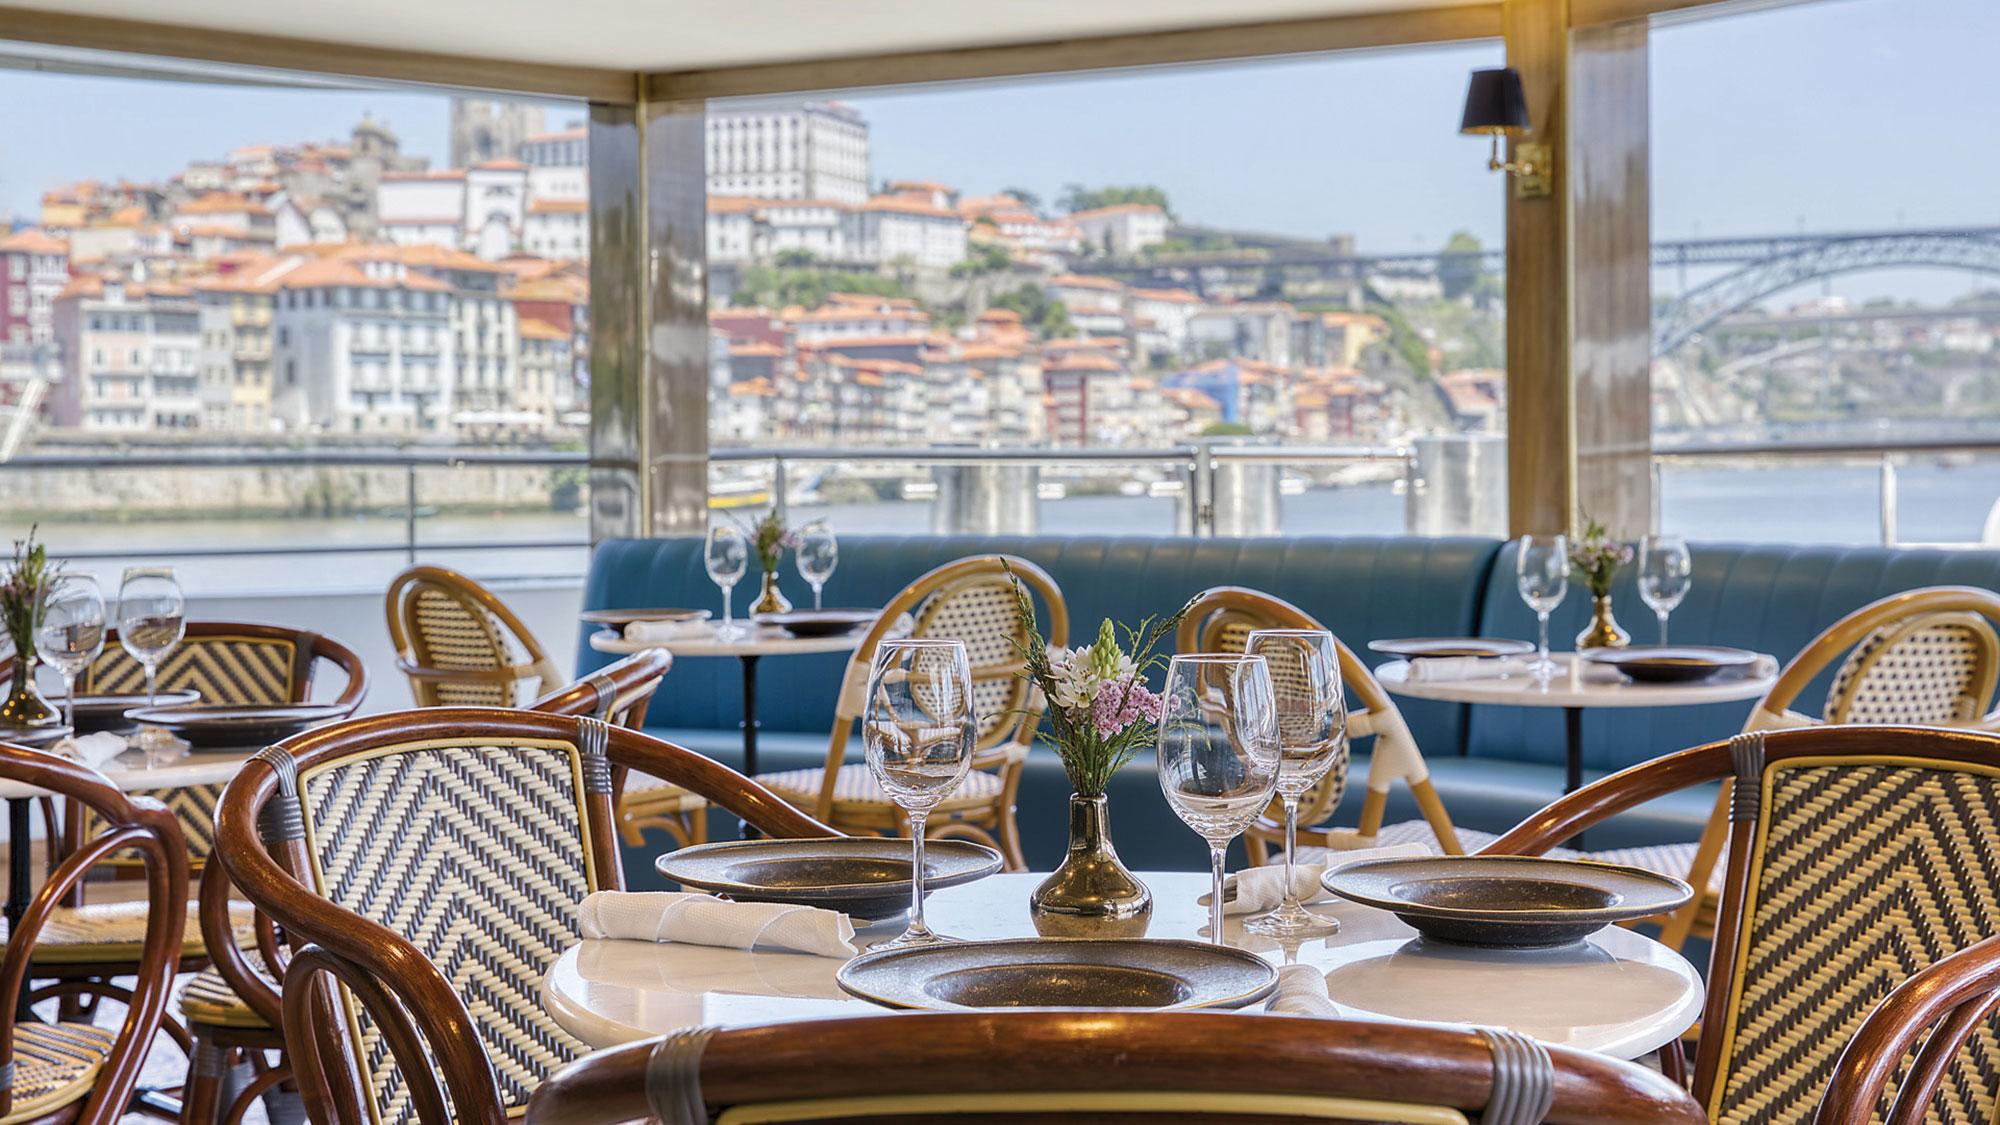 Uniworld's Sao Gabriel makes debut in Portugal